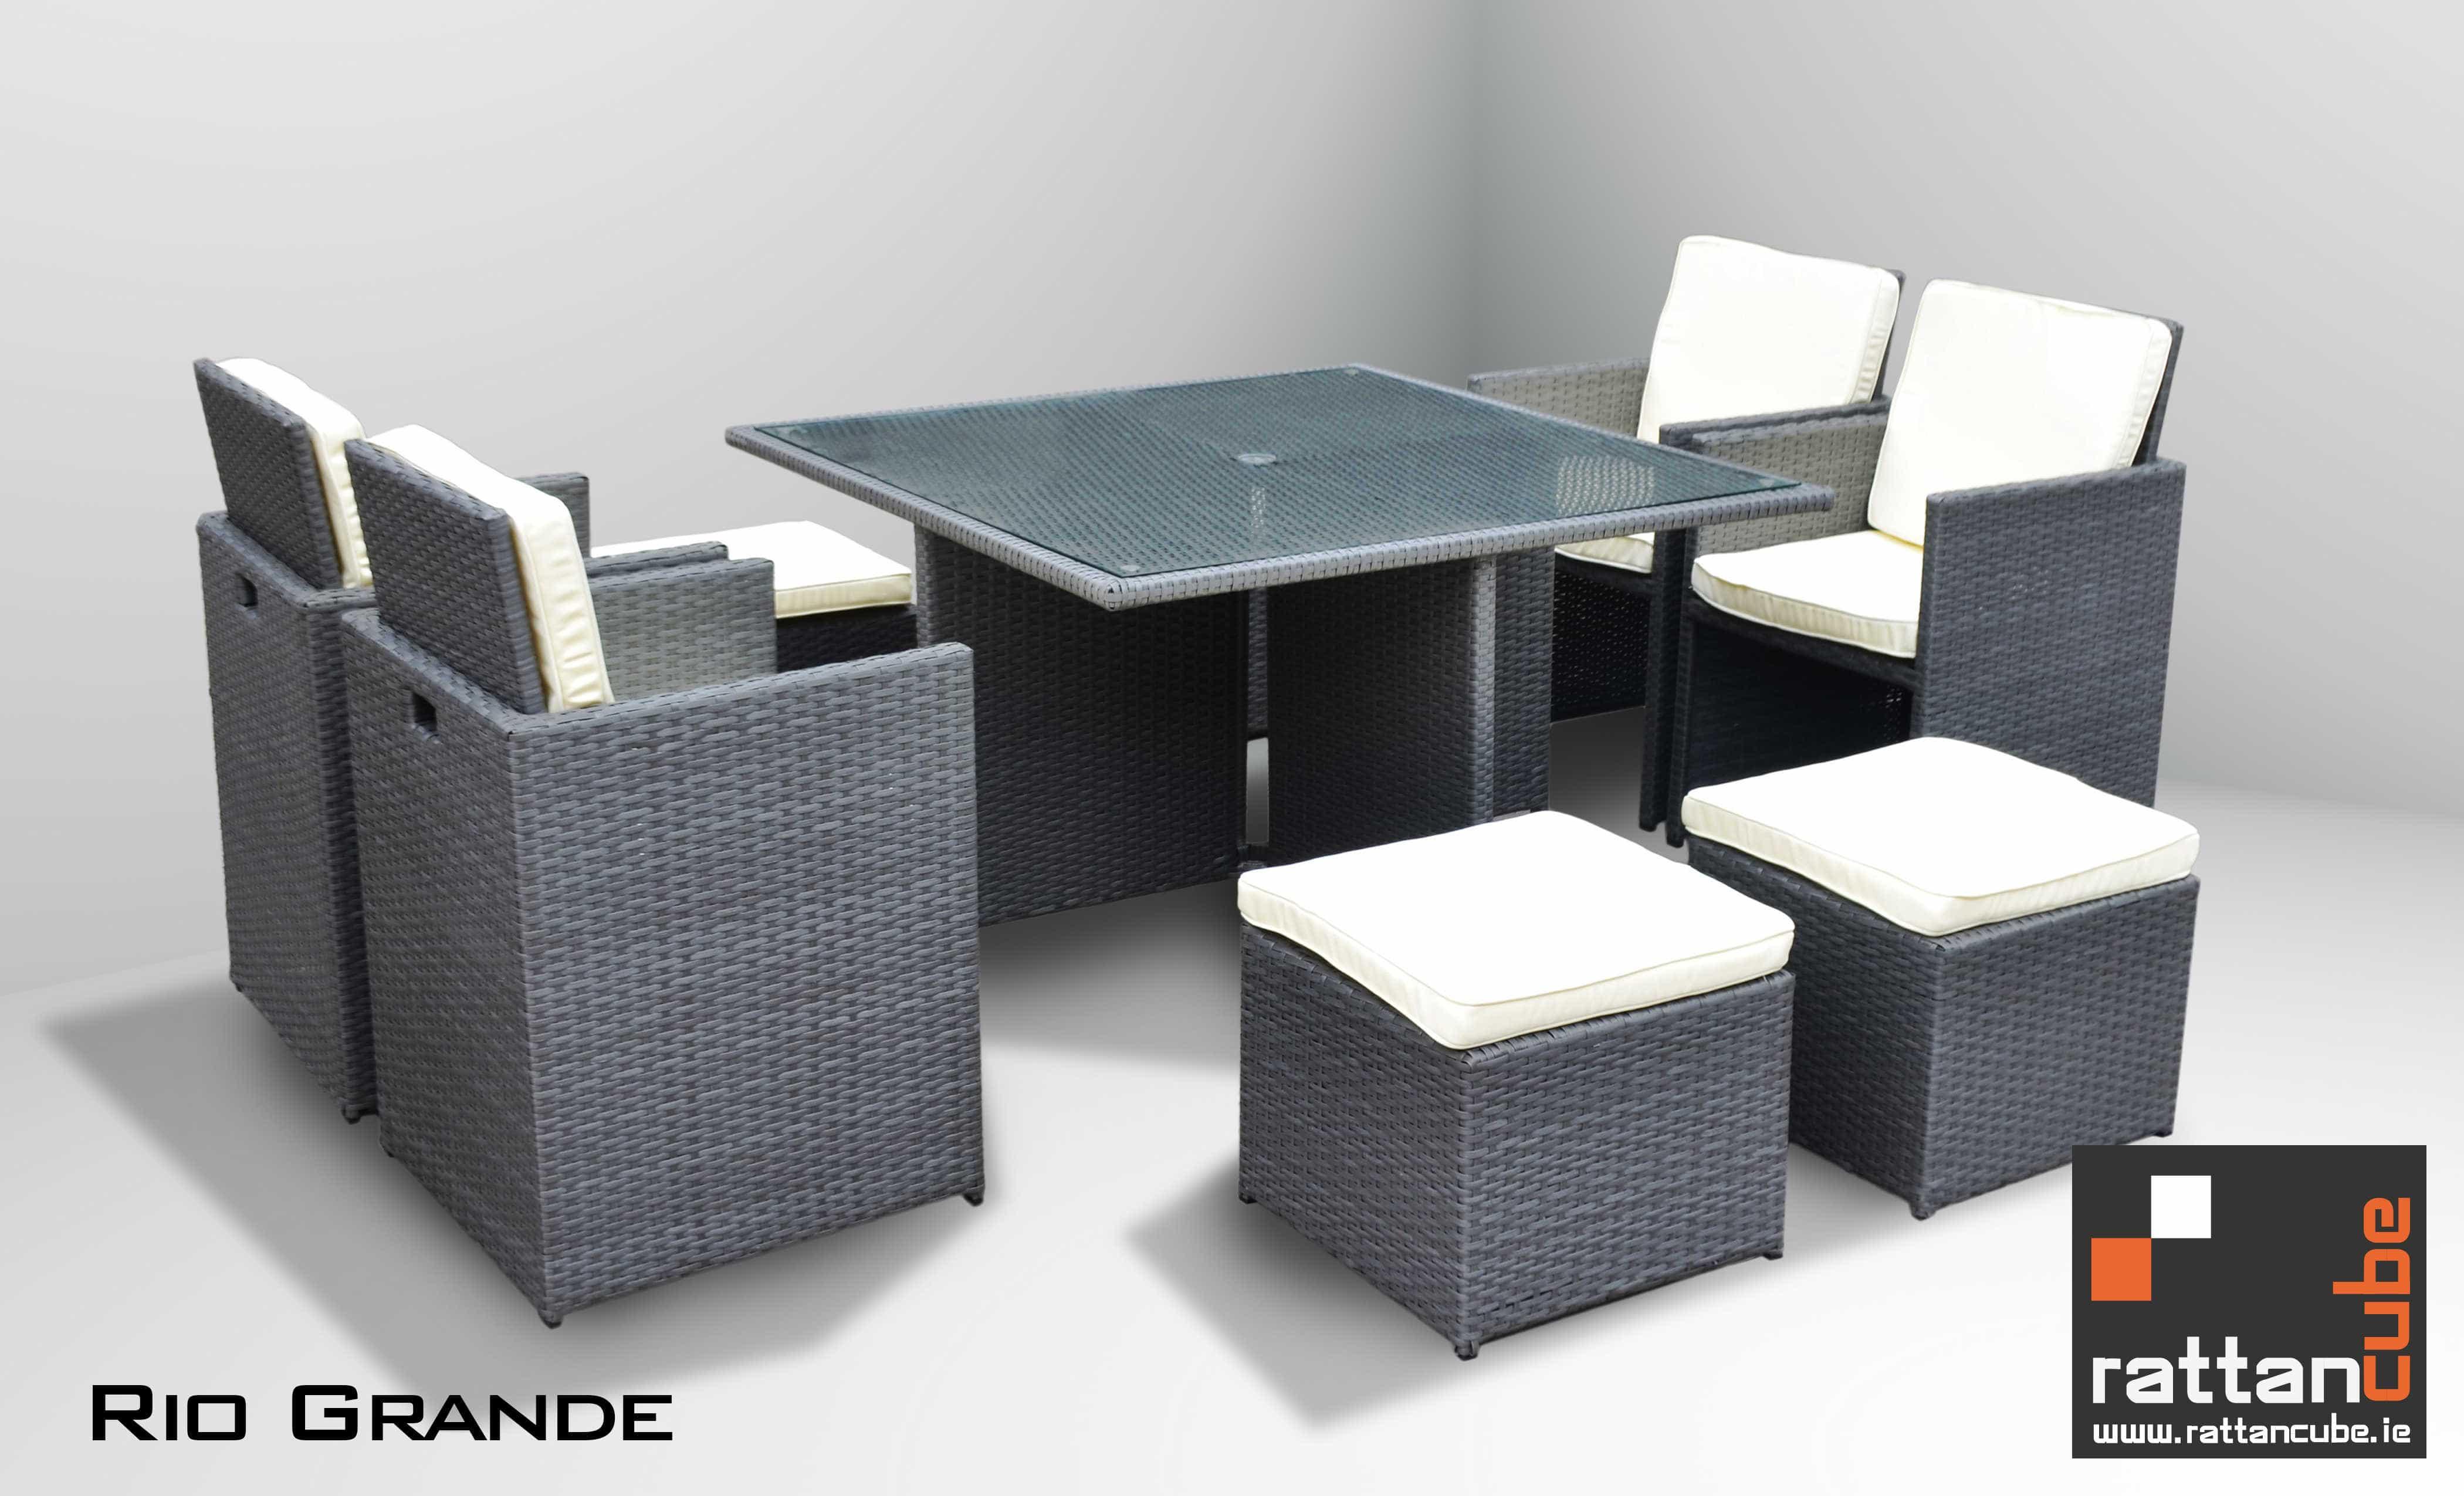 8 Seater Rio Grande – Garden Furniture Ireland Outdoor Furniture Ireland Ra